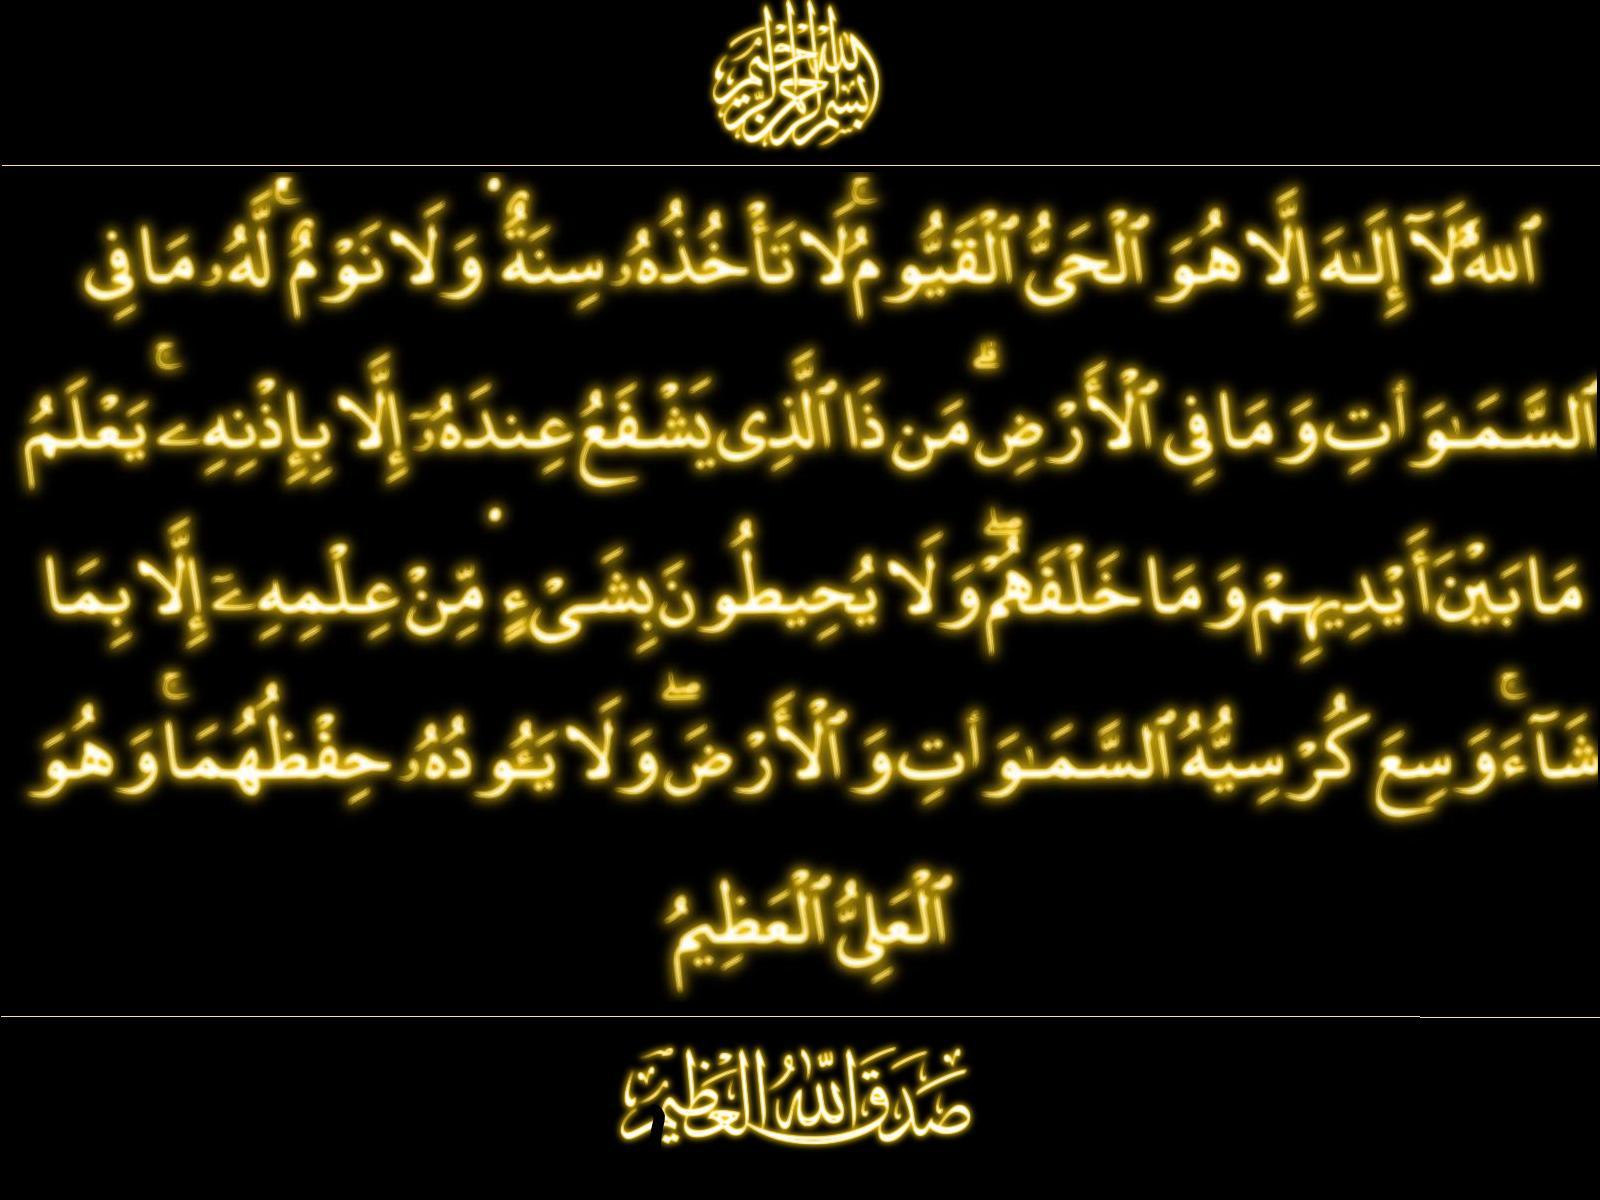 Islamic wallpaper: ayat-al-kursi Wallpaper